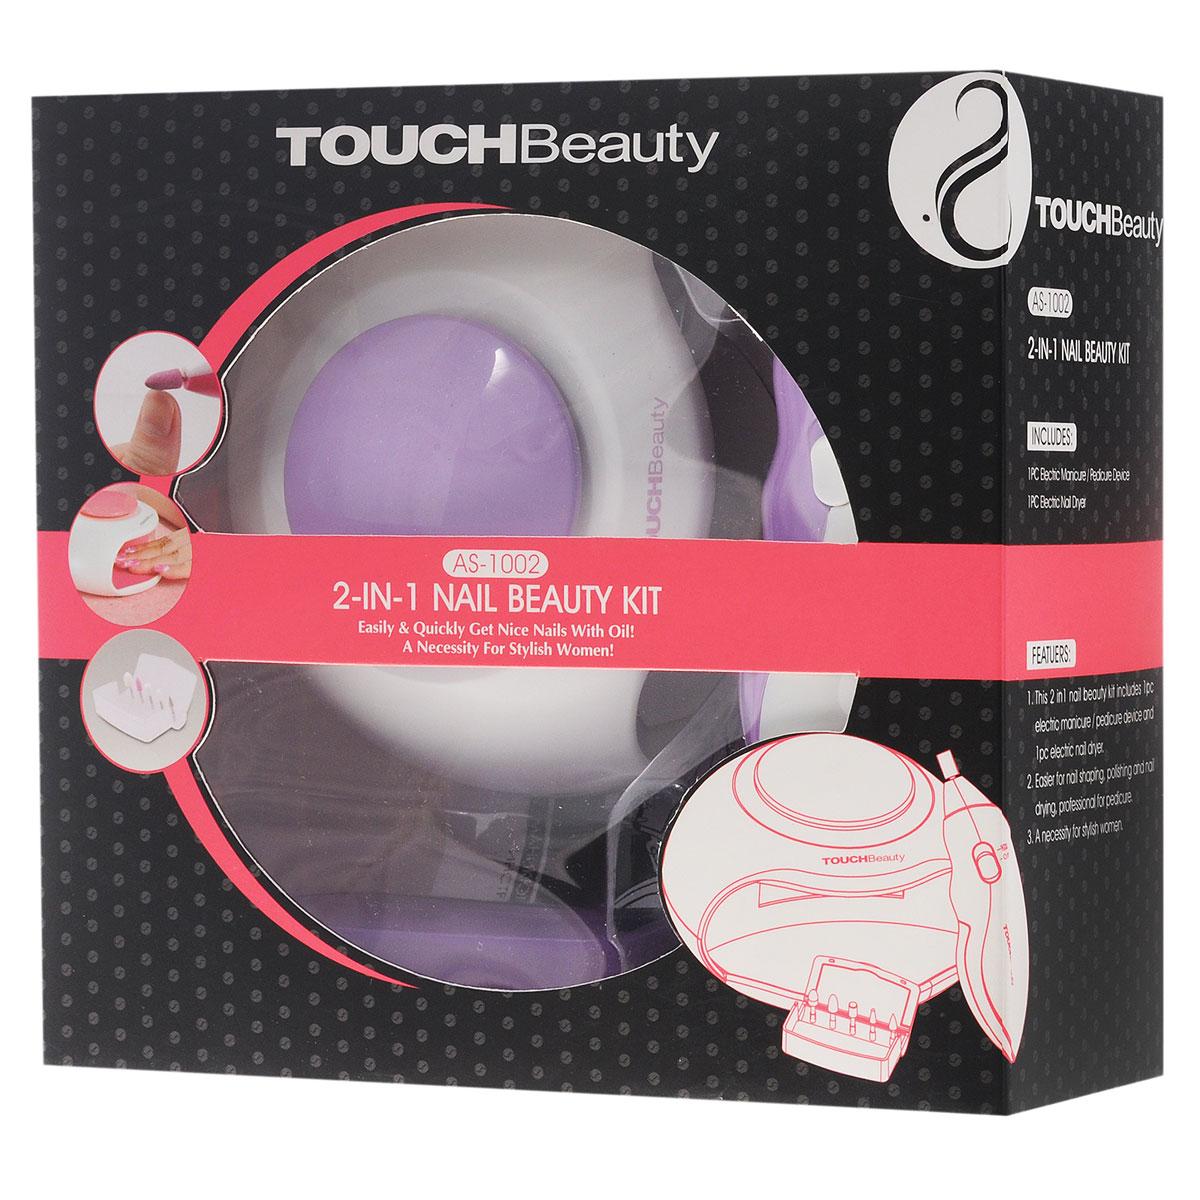 Touchbeauty Маникюрный набор 2в1 Nail Beauty Kit, цвет: сиреневый. AS-1002